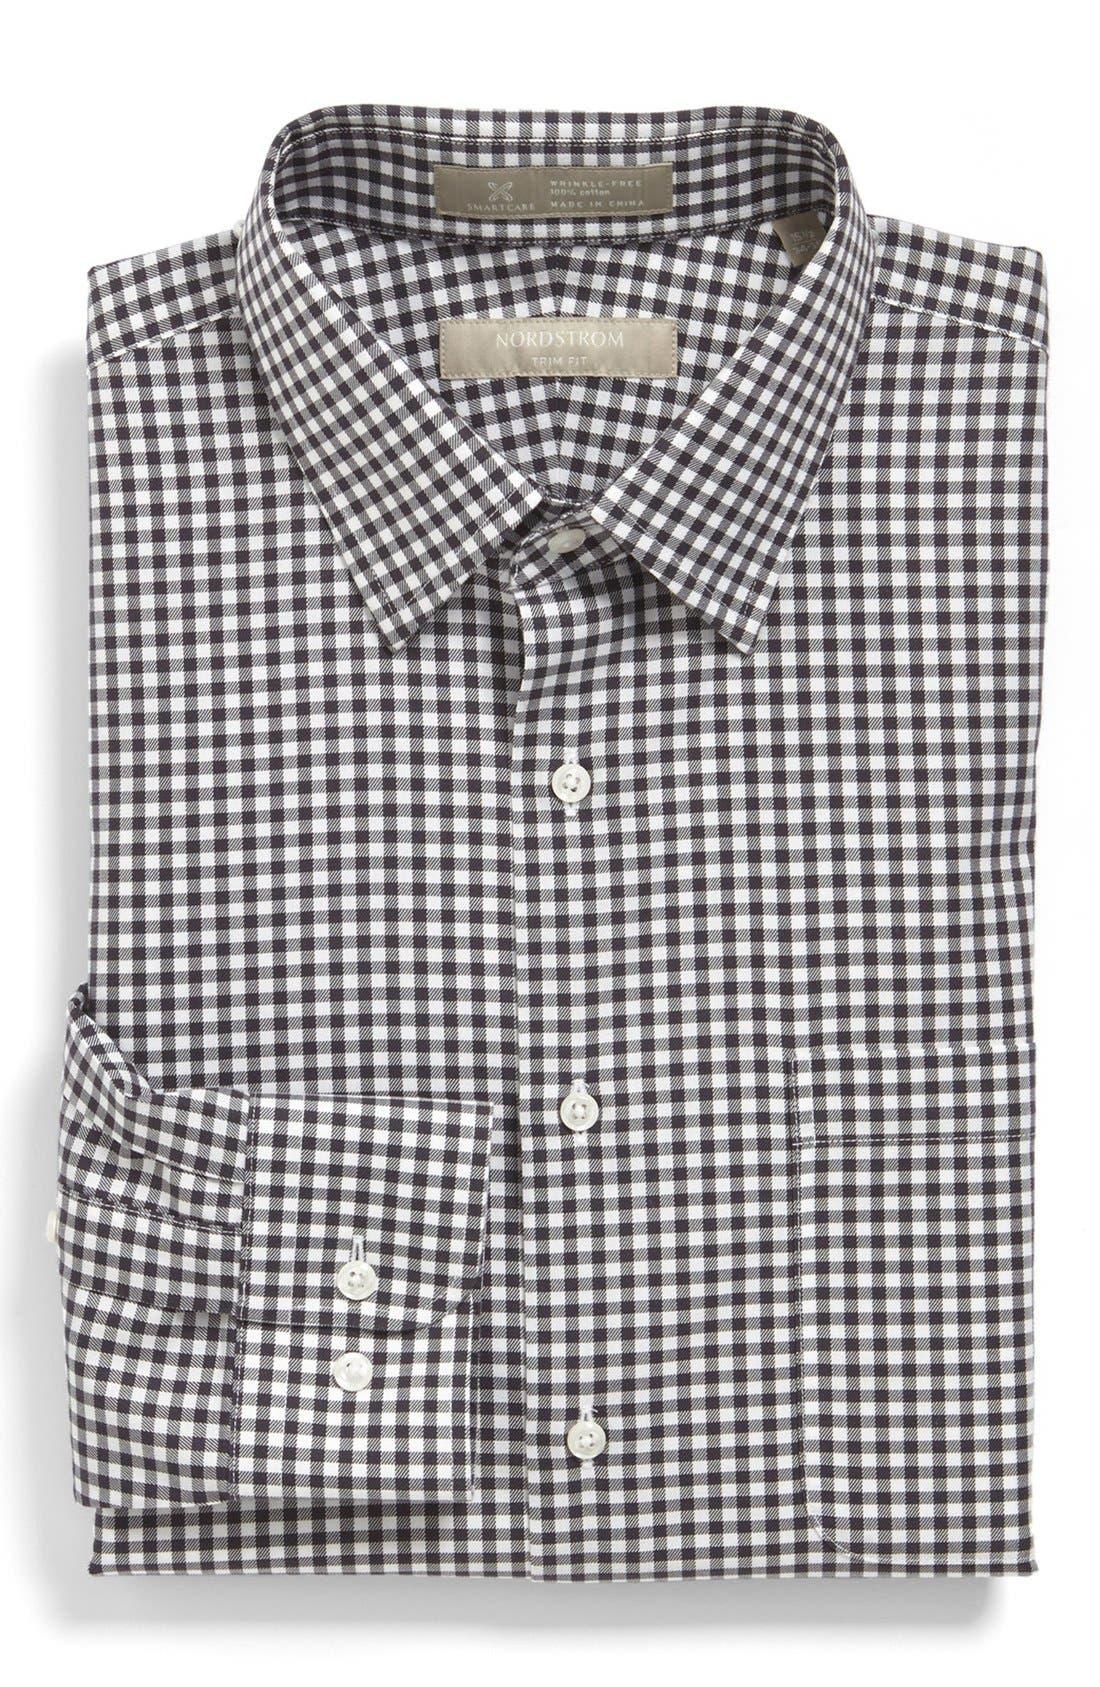 NORDSTROM MEN'S SHOP, Nordstrom Smartcare<sup>™</sup> Wrinkle Free Trim Fit Dress Shirt, Main thumbnail 1, color, 021